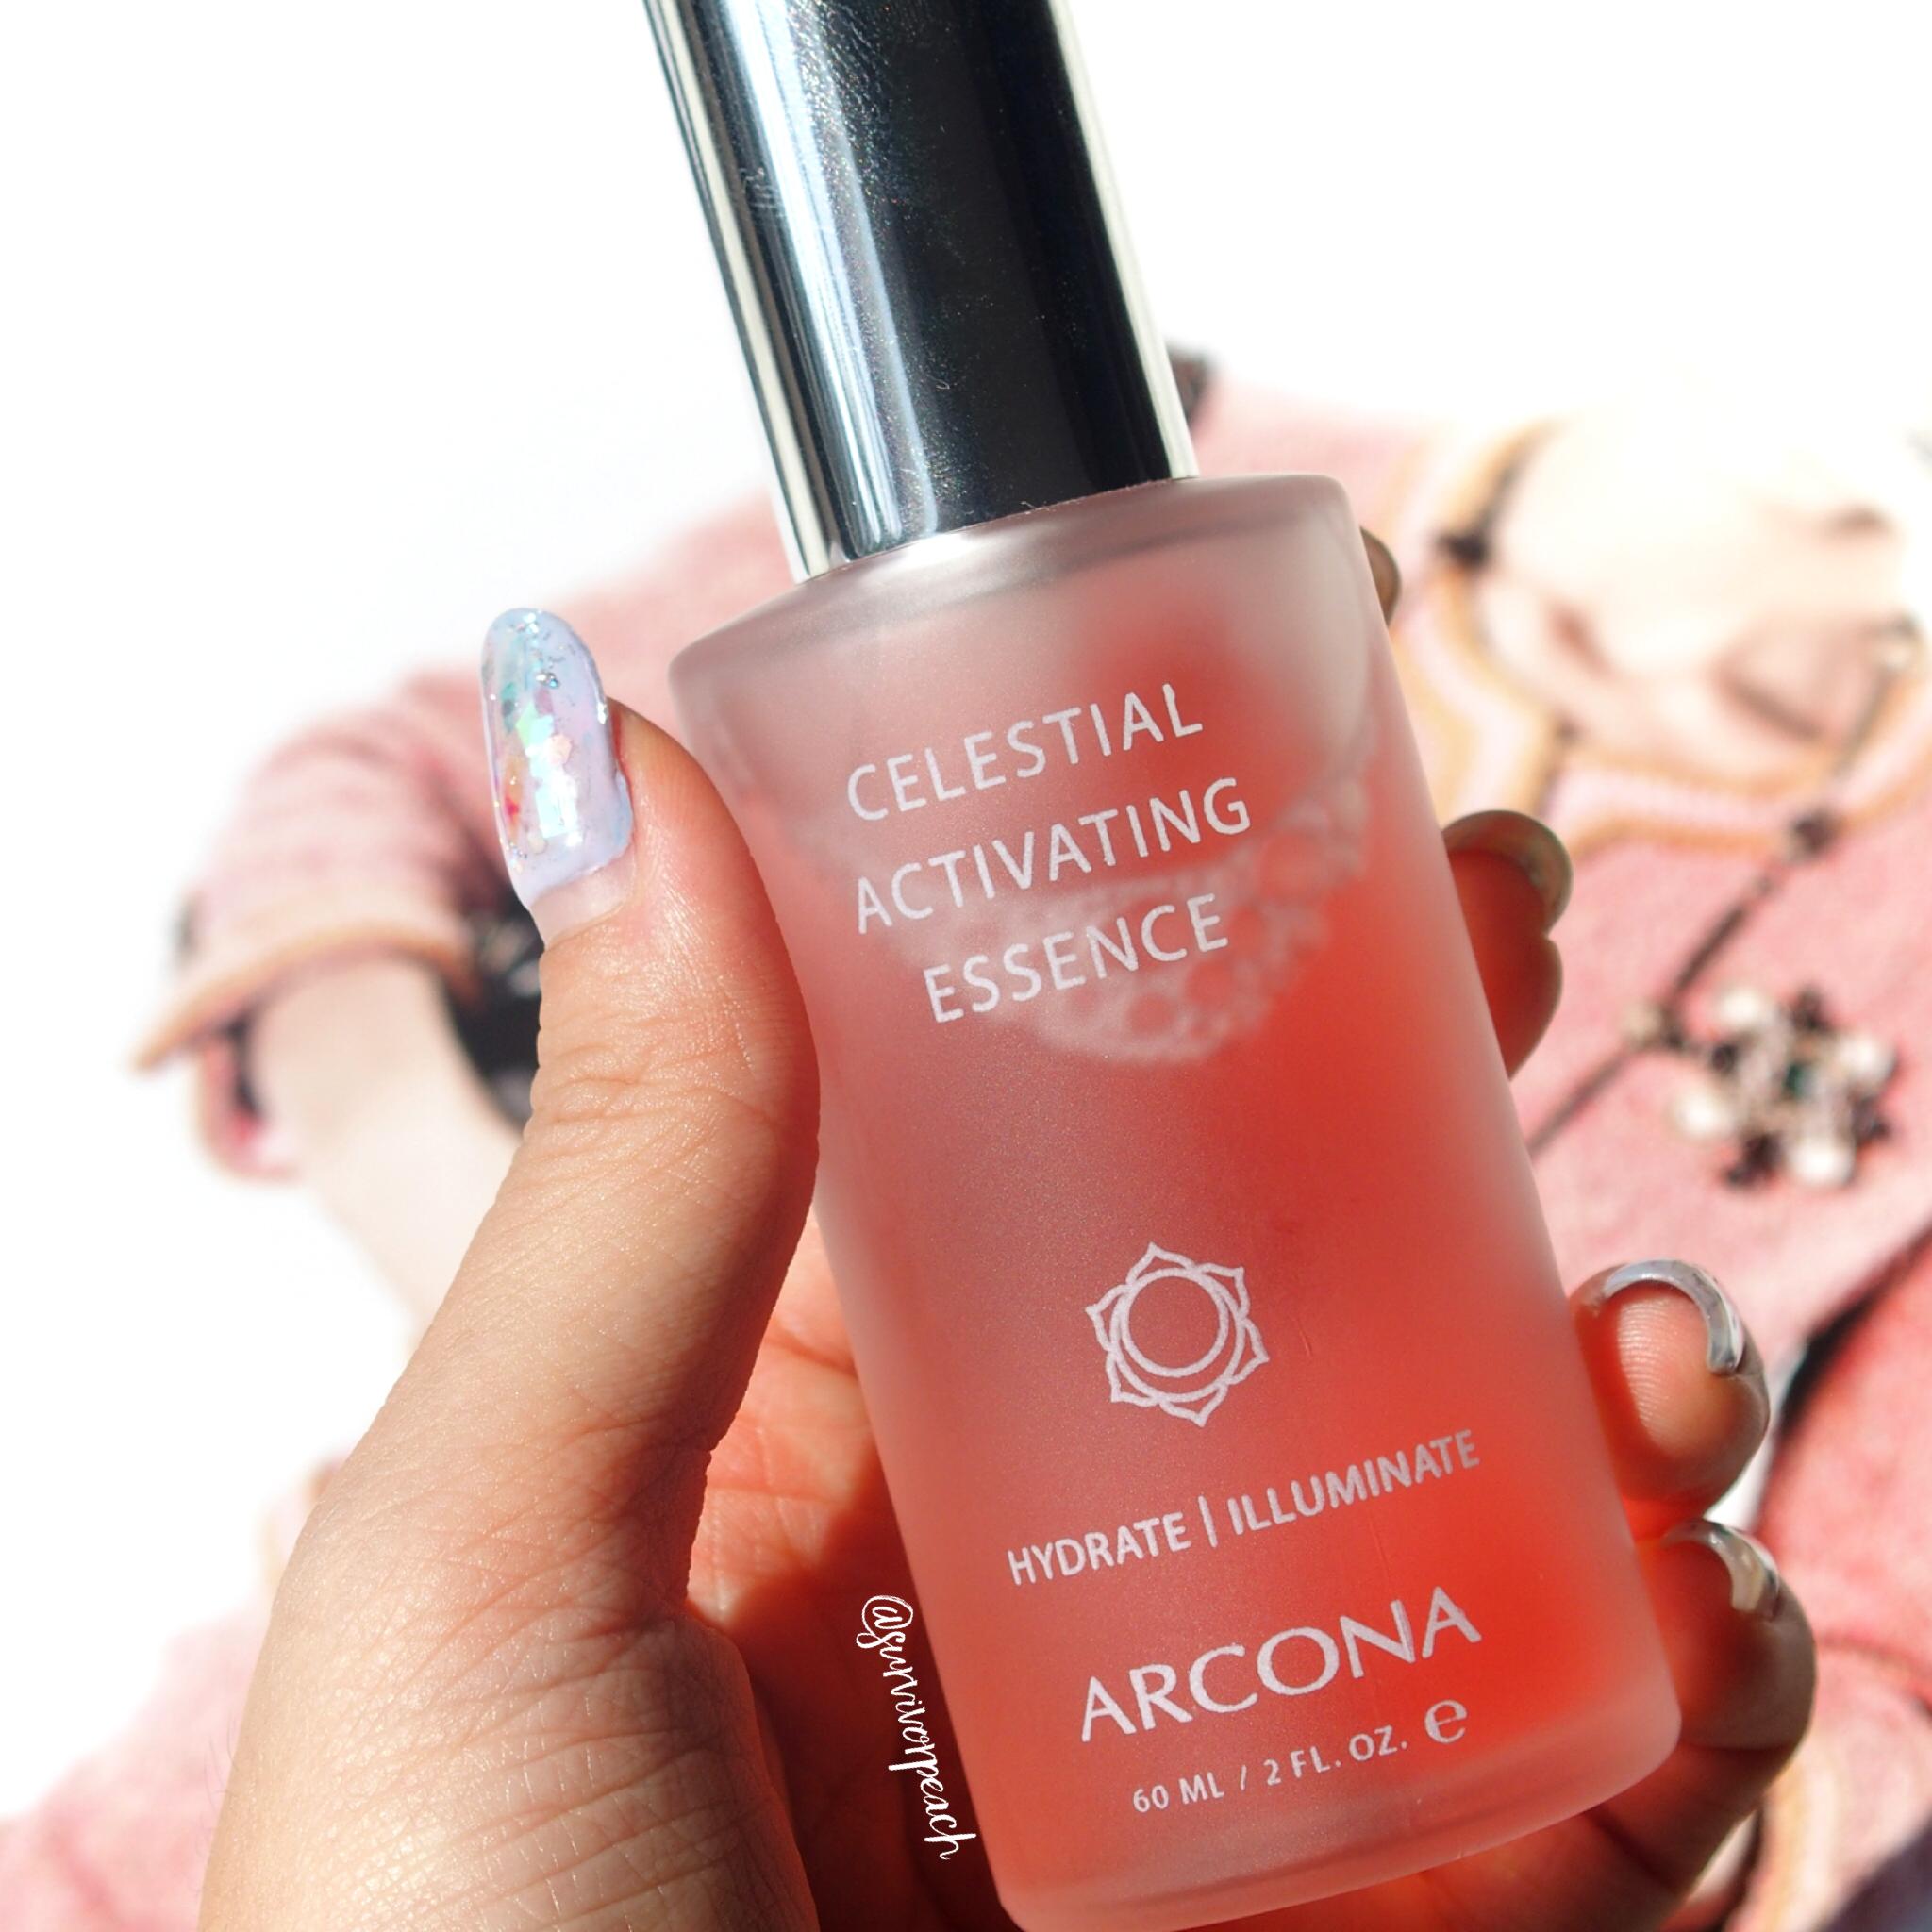 Arcona Celestial Activating Essence